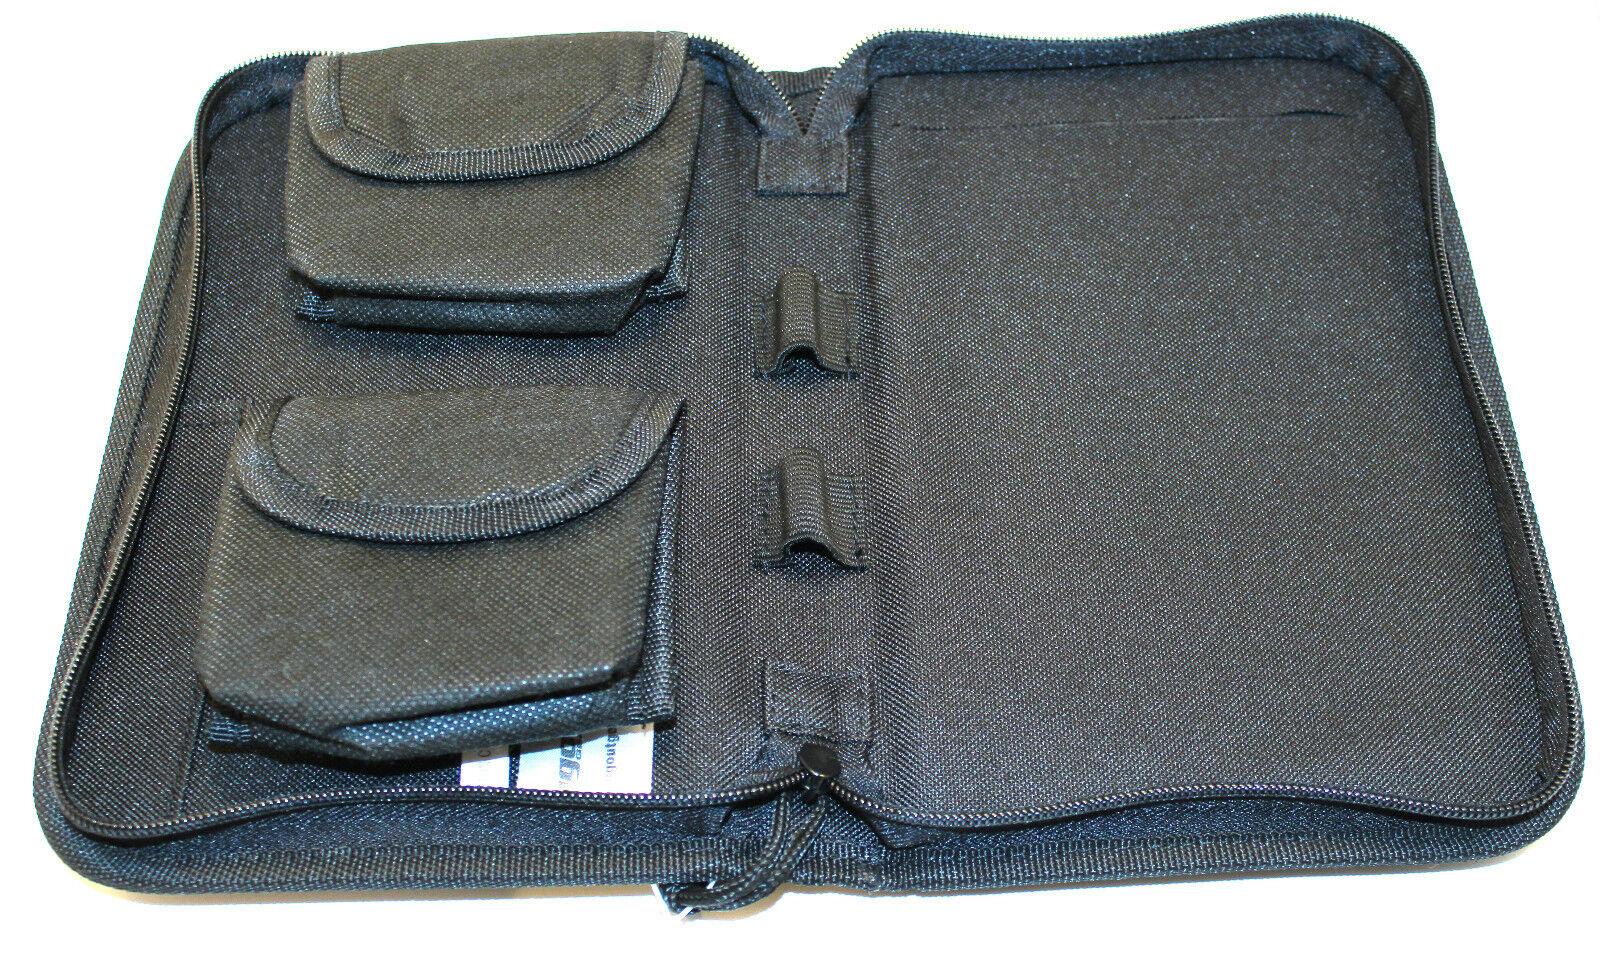 Bugout gear -- Admin Folio, TEOTWAWKI, préparant, Bivi, PACK, EDC, EDC, EDC, bug out bag 6a2497